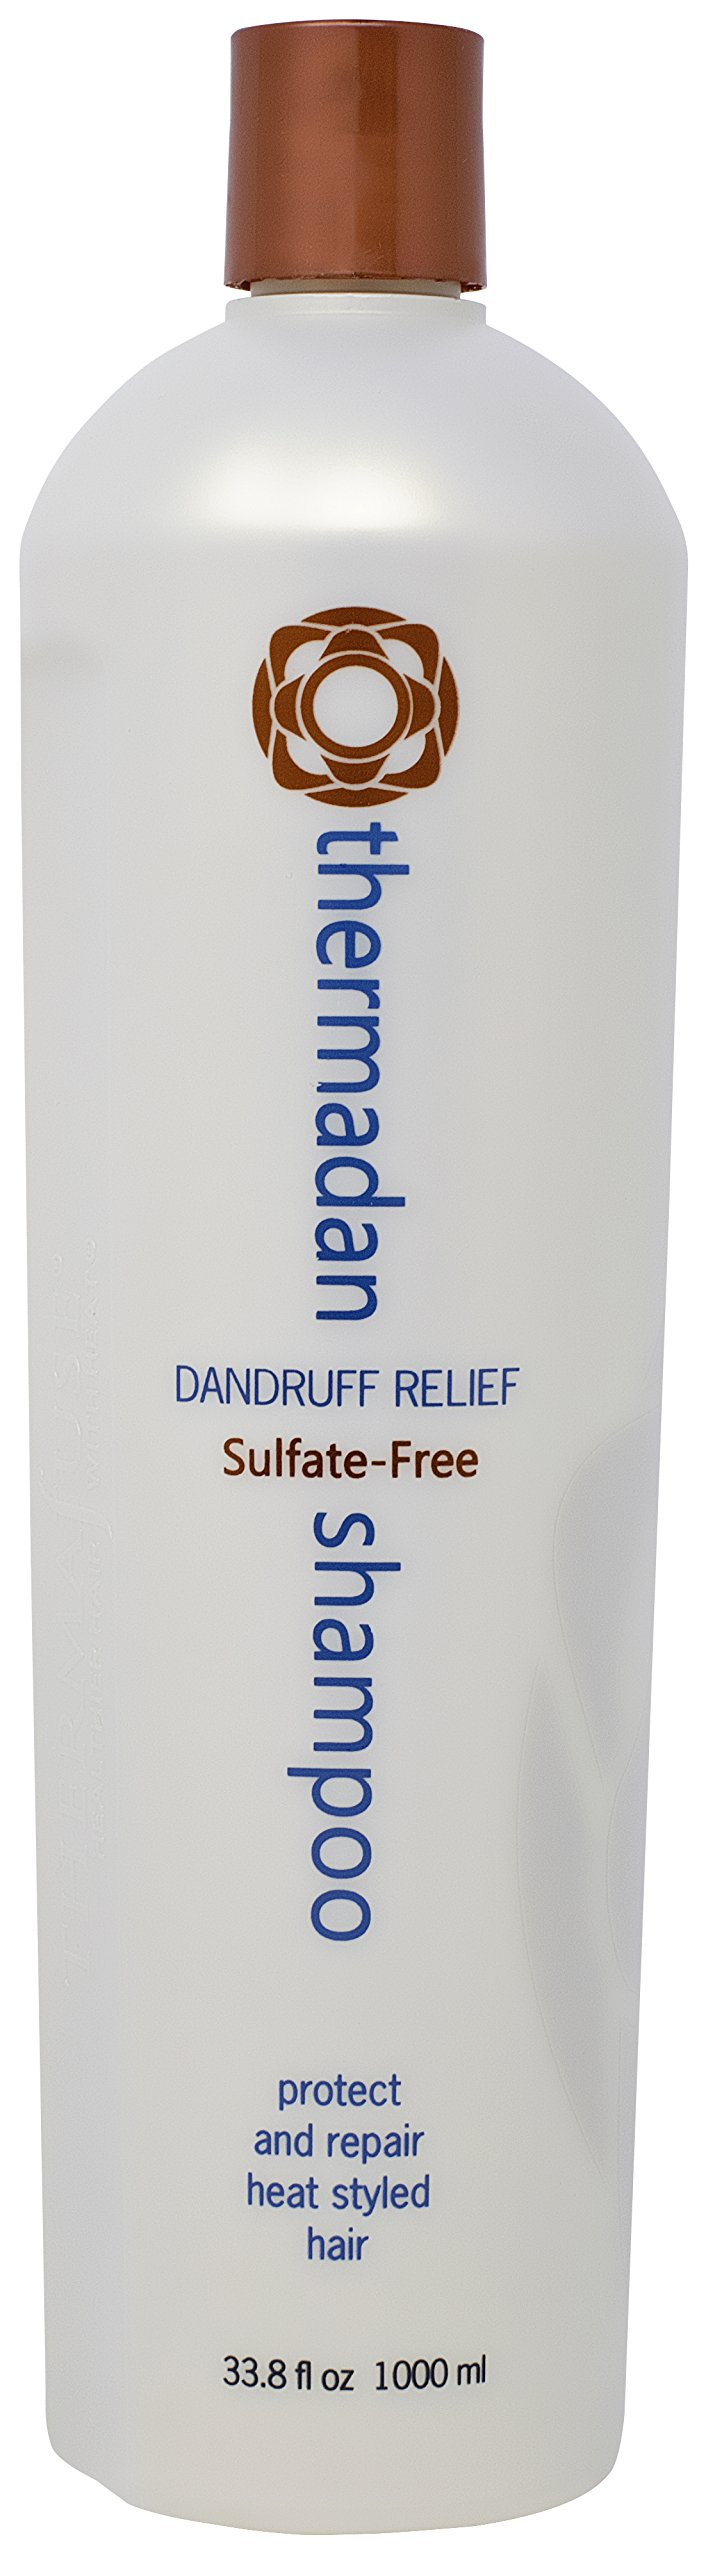 Thermafuse Thermadan Dandruff Shampoo 33.8 oz FDA Approved Anti Dandruff, Anti Flakey Scalp, Anti Scalp Itch Dandruff Treatment Shampoo, Sulfate Free & Tea Tree Oil - Daily Use for Women & Men by Thermafuse